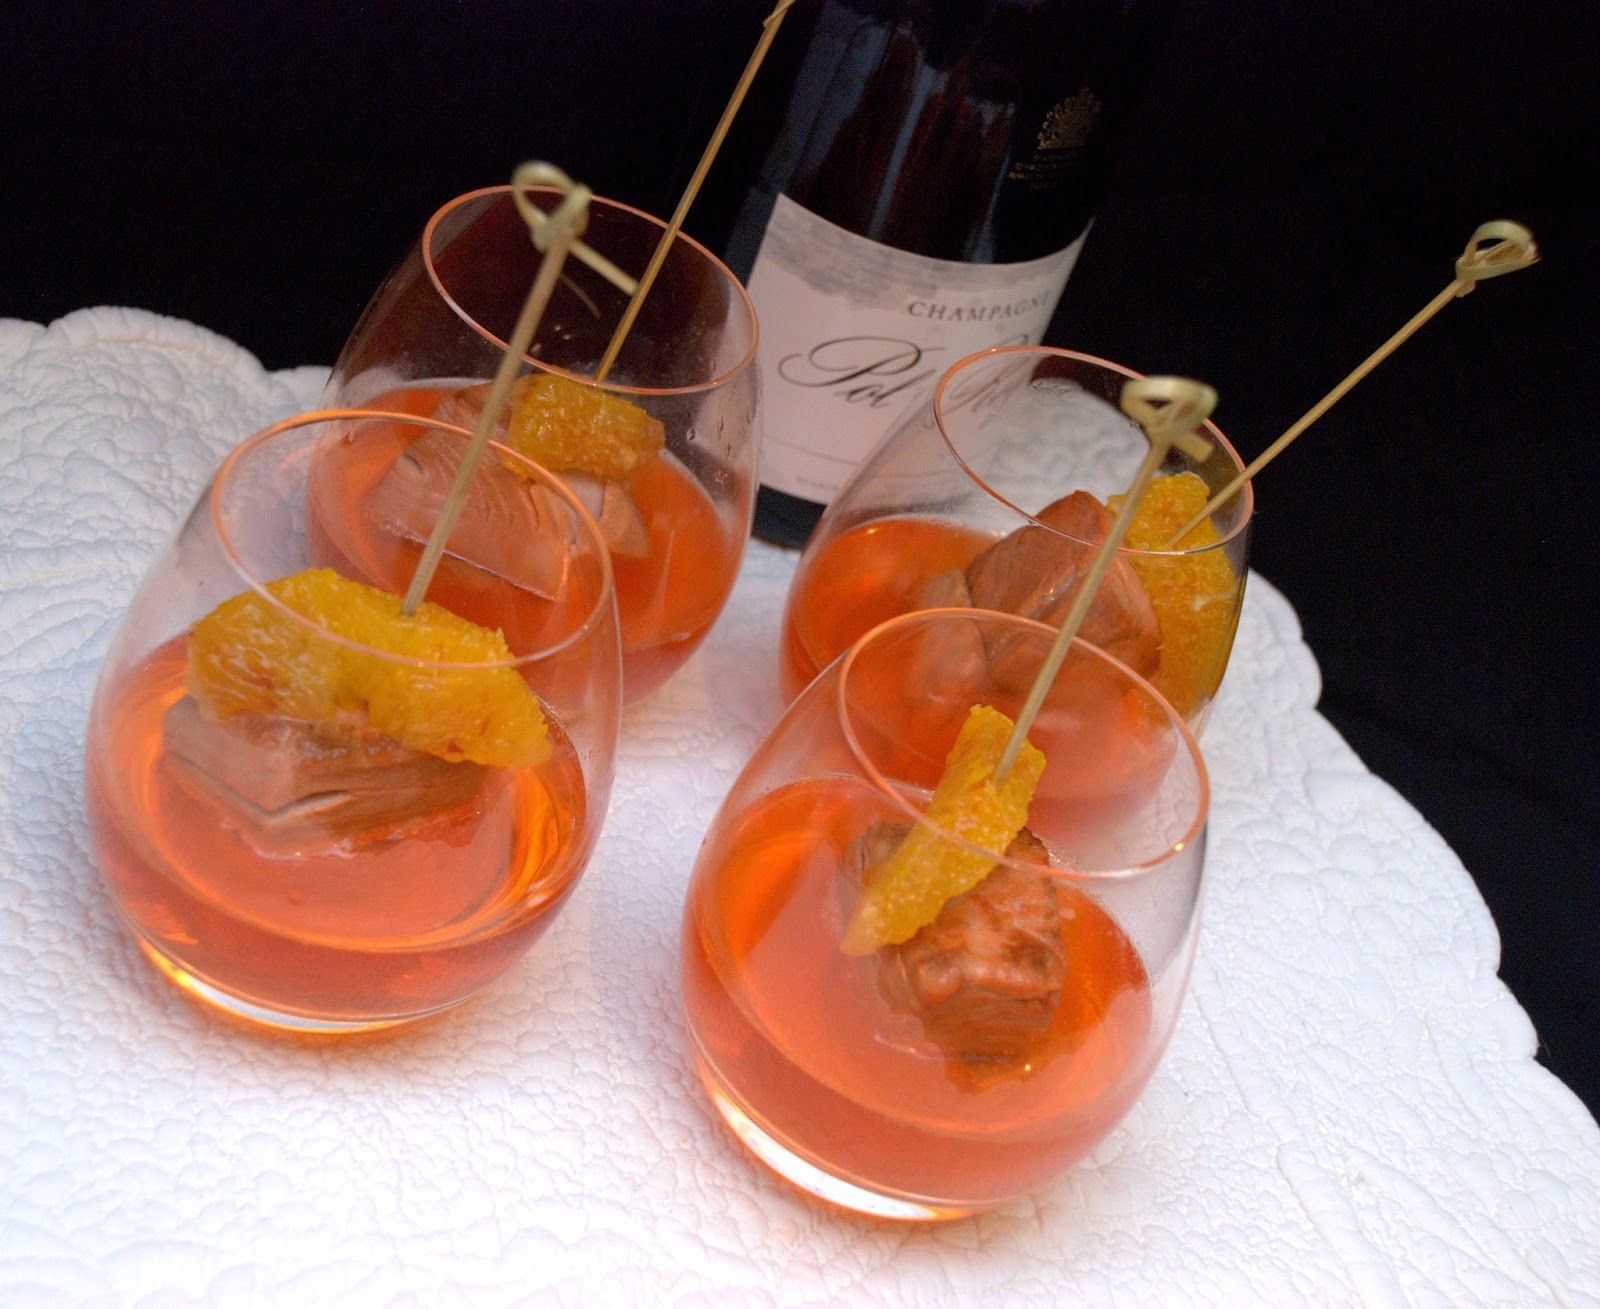 Un aperitivo tavola rotonda for Bicchieri aperol spritz